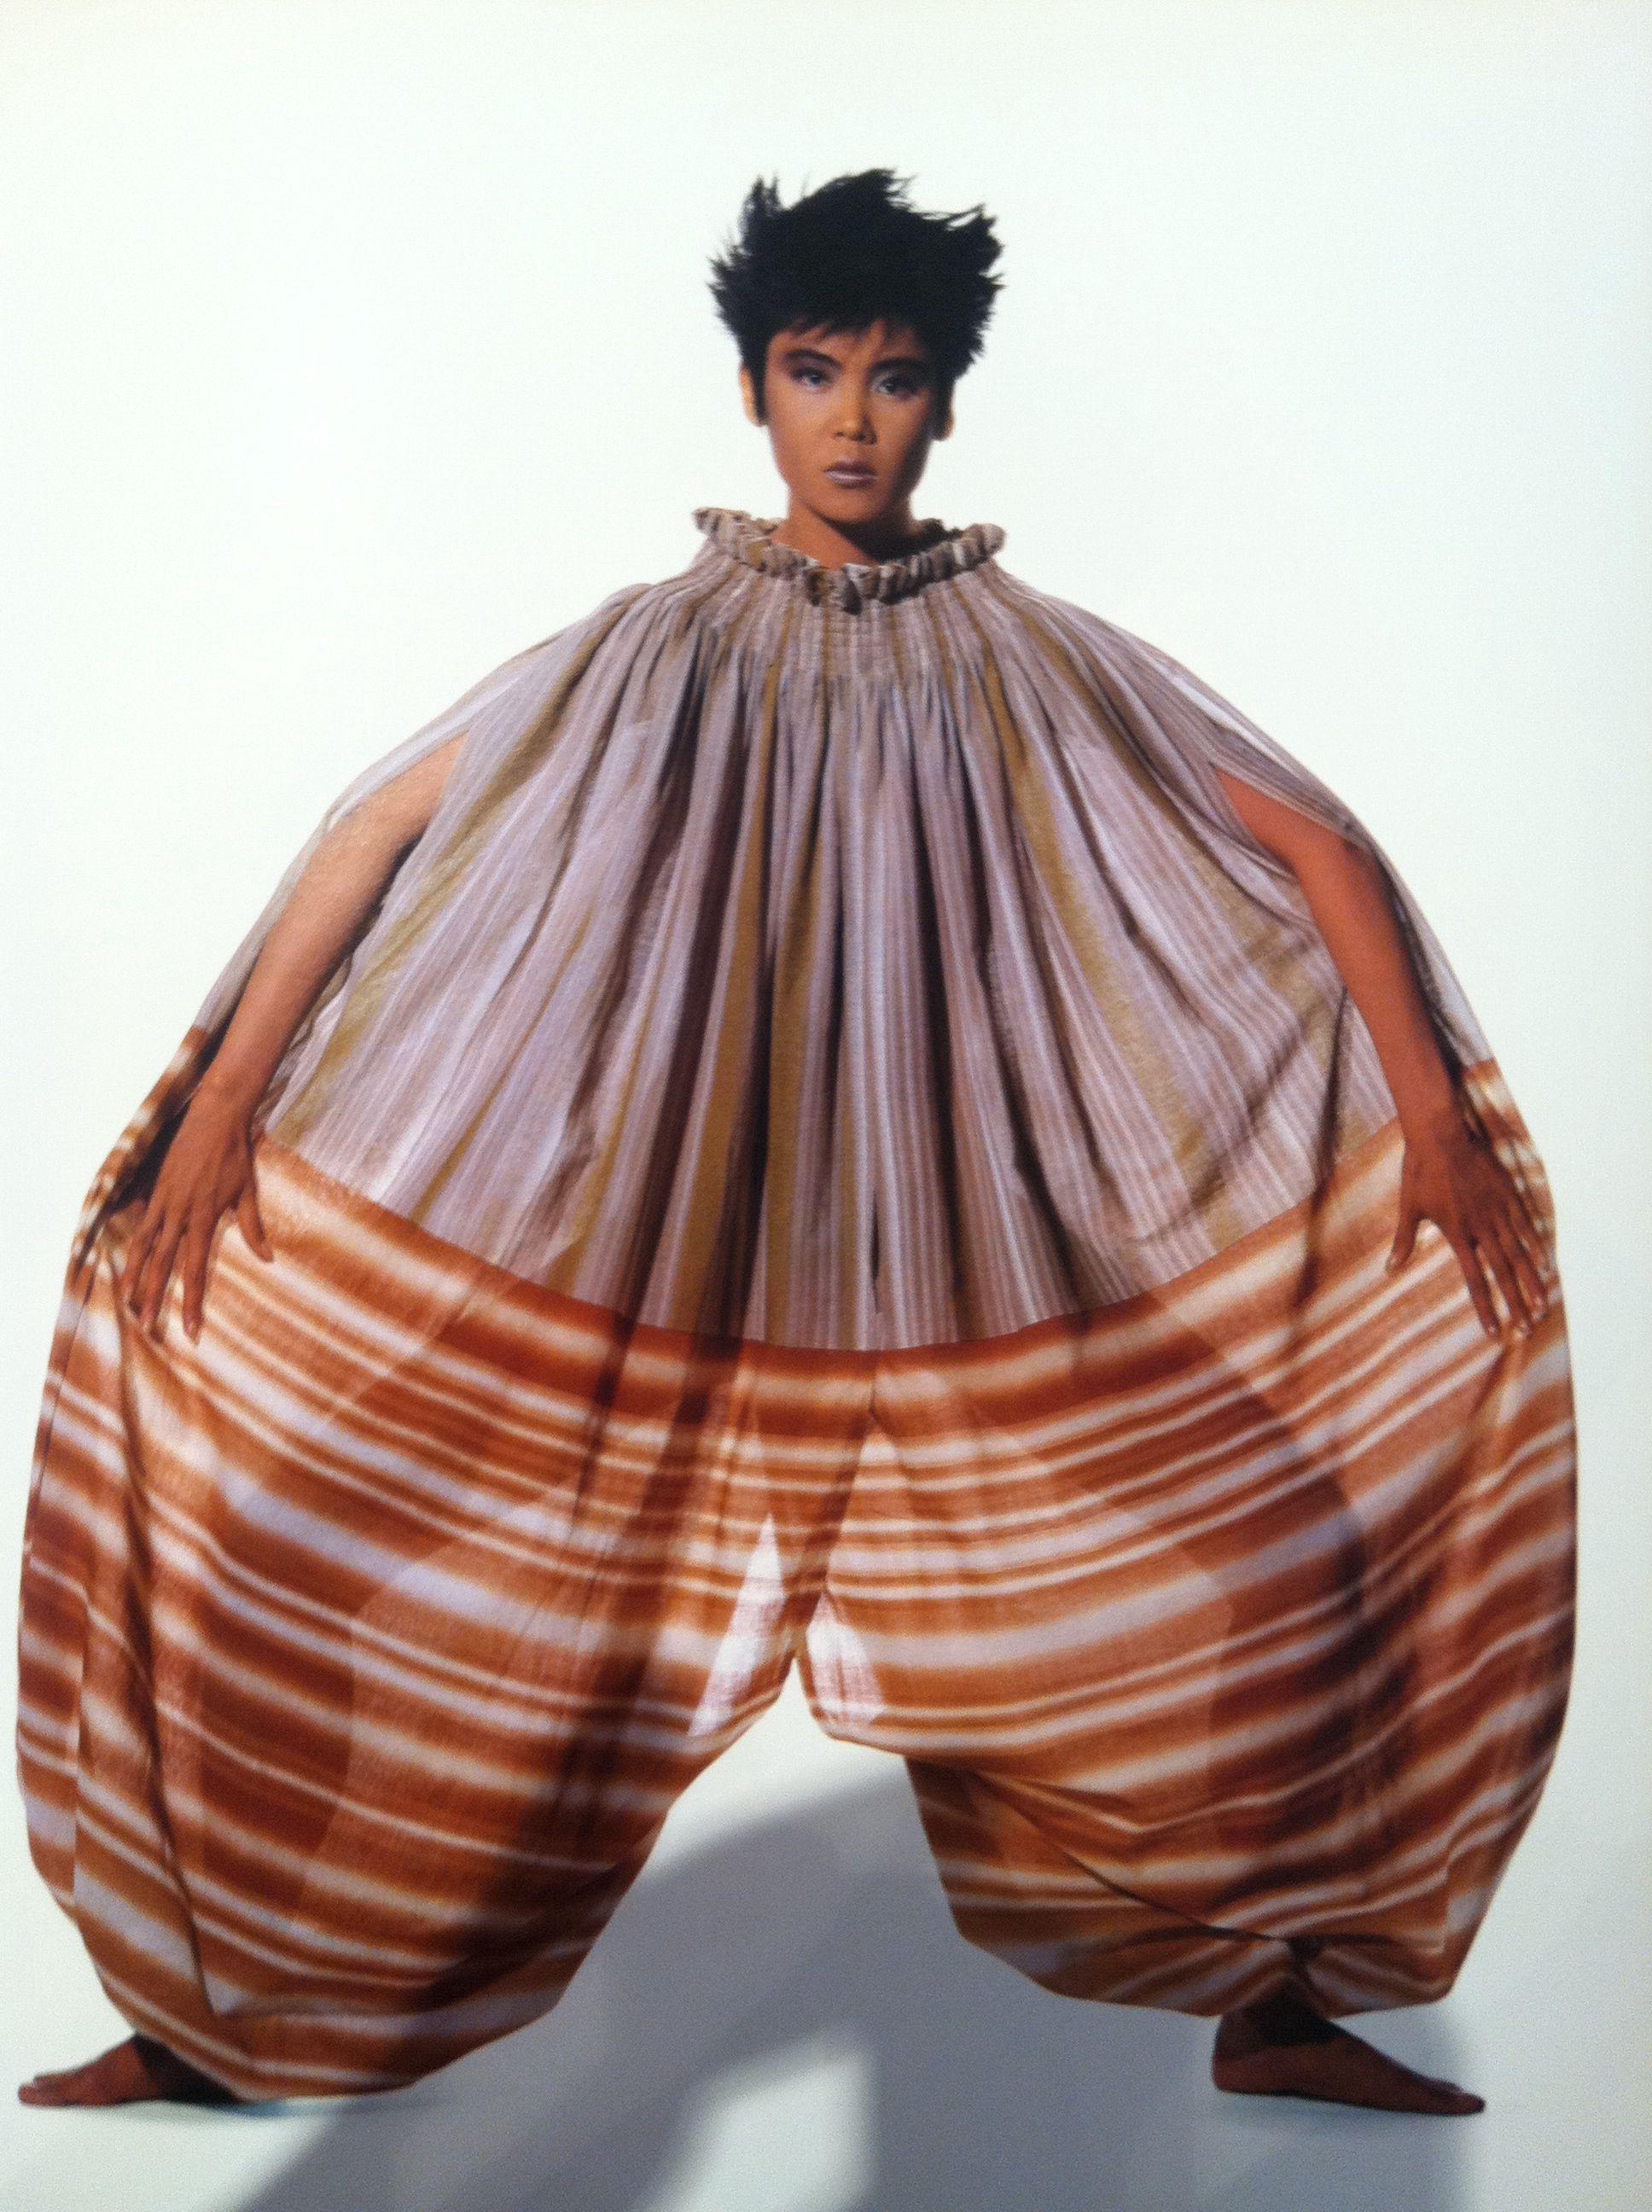 Issey Miyake By Irving Penn 80s Fashion Trends Japanese Fashion Designers Fashion